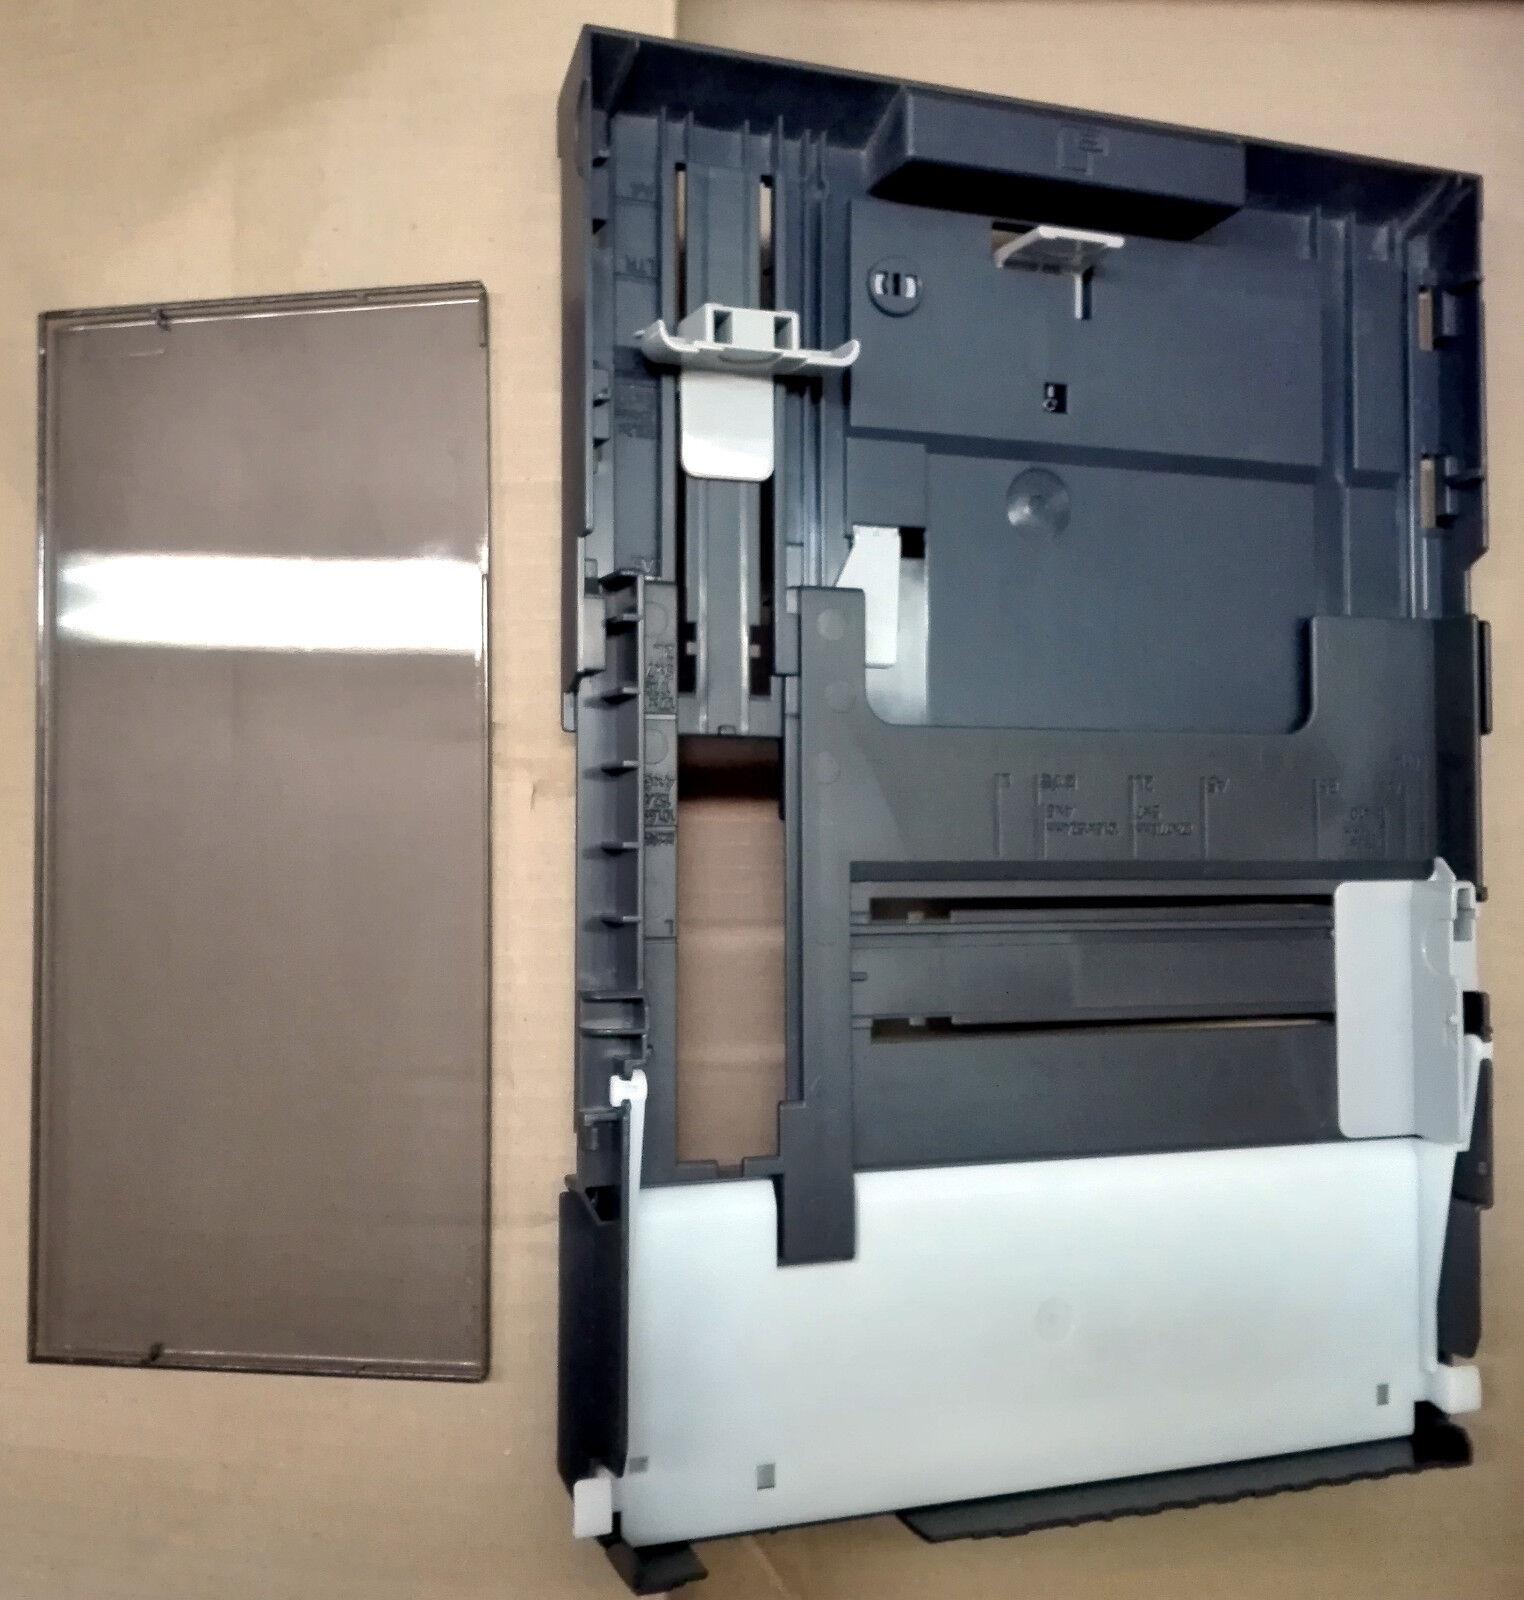 Vassoi vassoio carta feeder stampante per Canon Pixma iP4300 A1180 T3-2